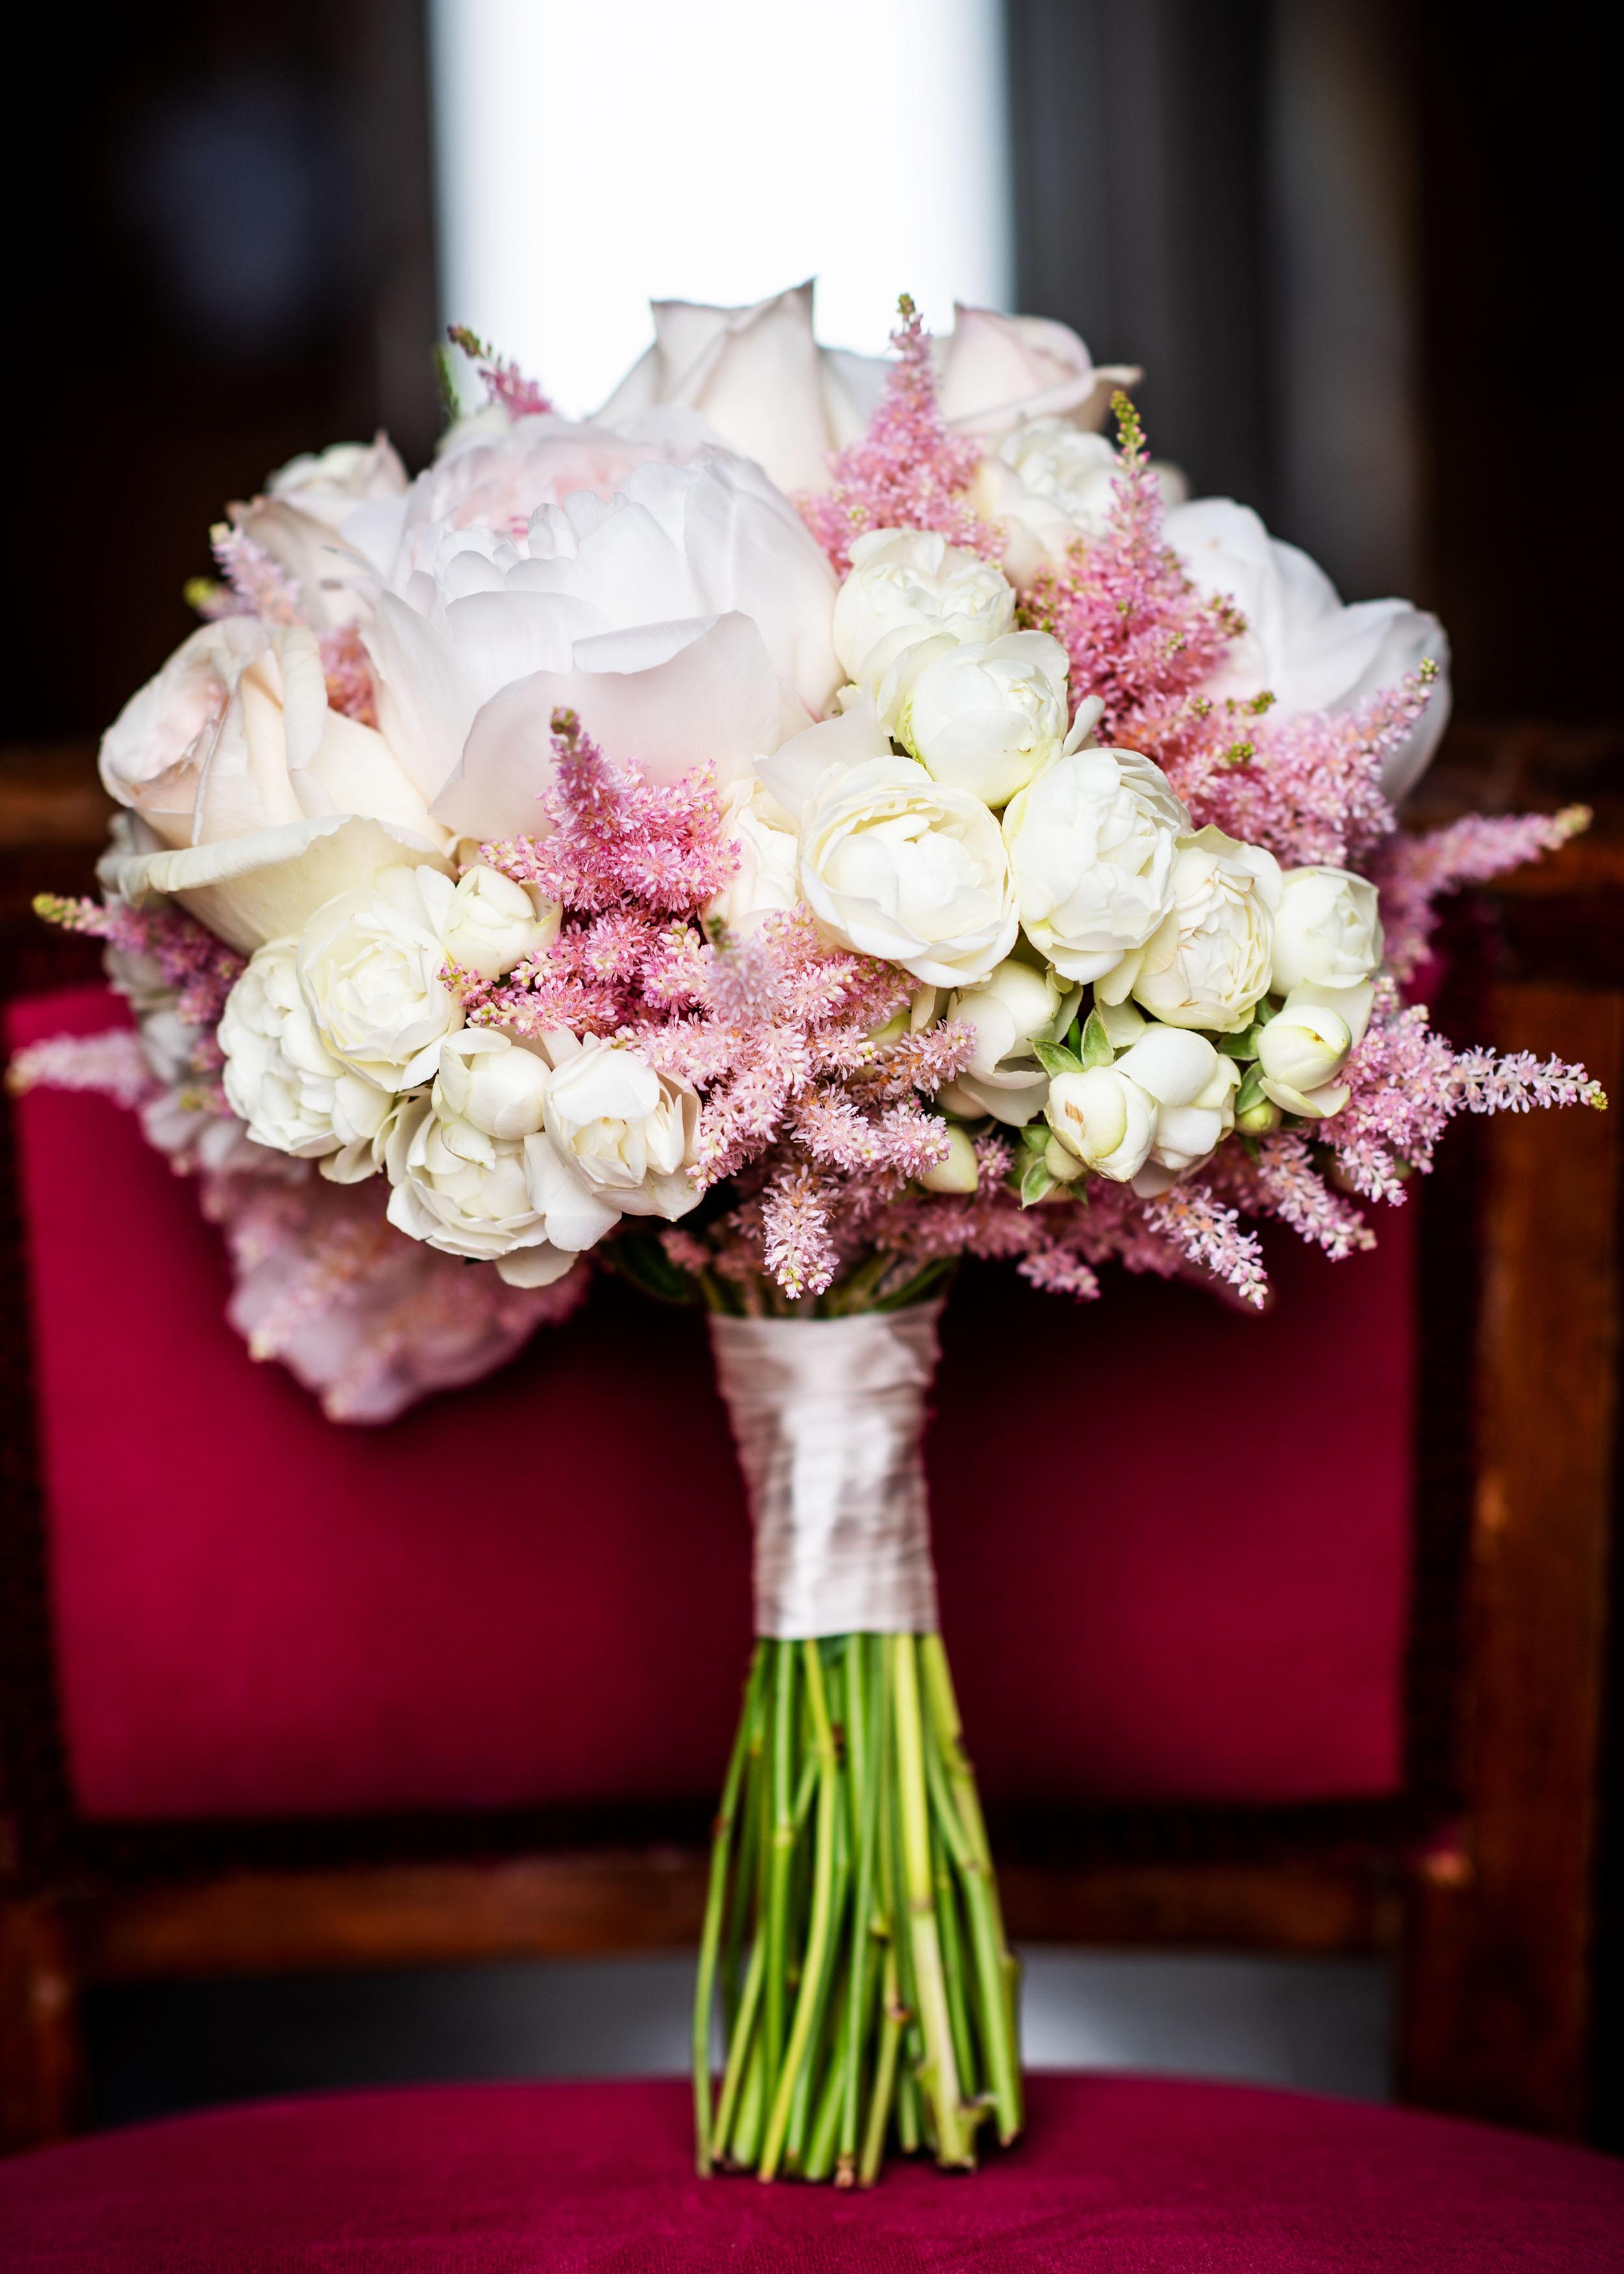 http://www.weddingamalfi.com/wp-content/uploads/Katia-Jorge-18-maggio-2019-19.jpg